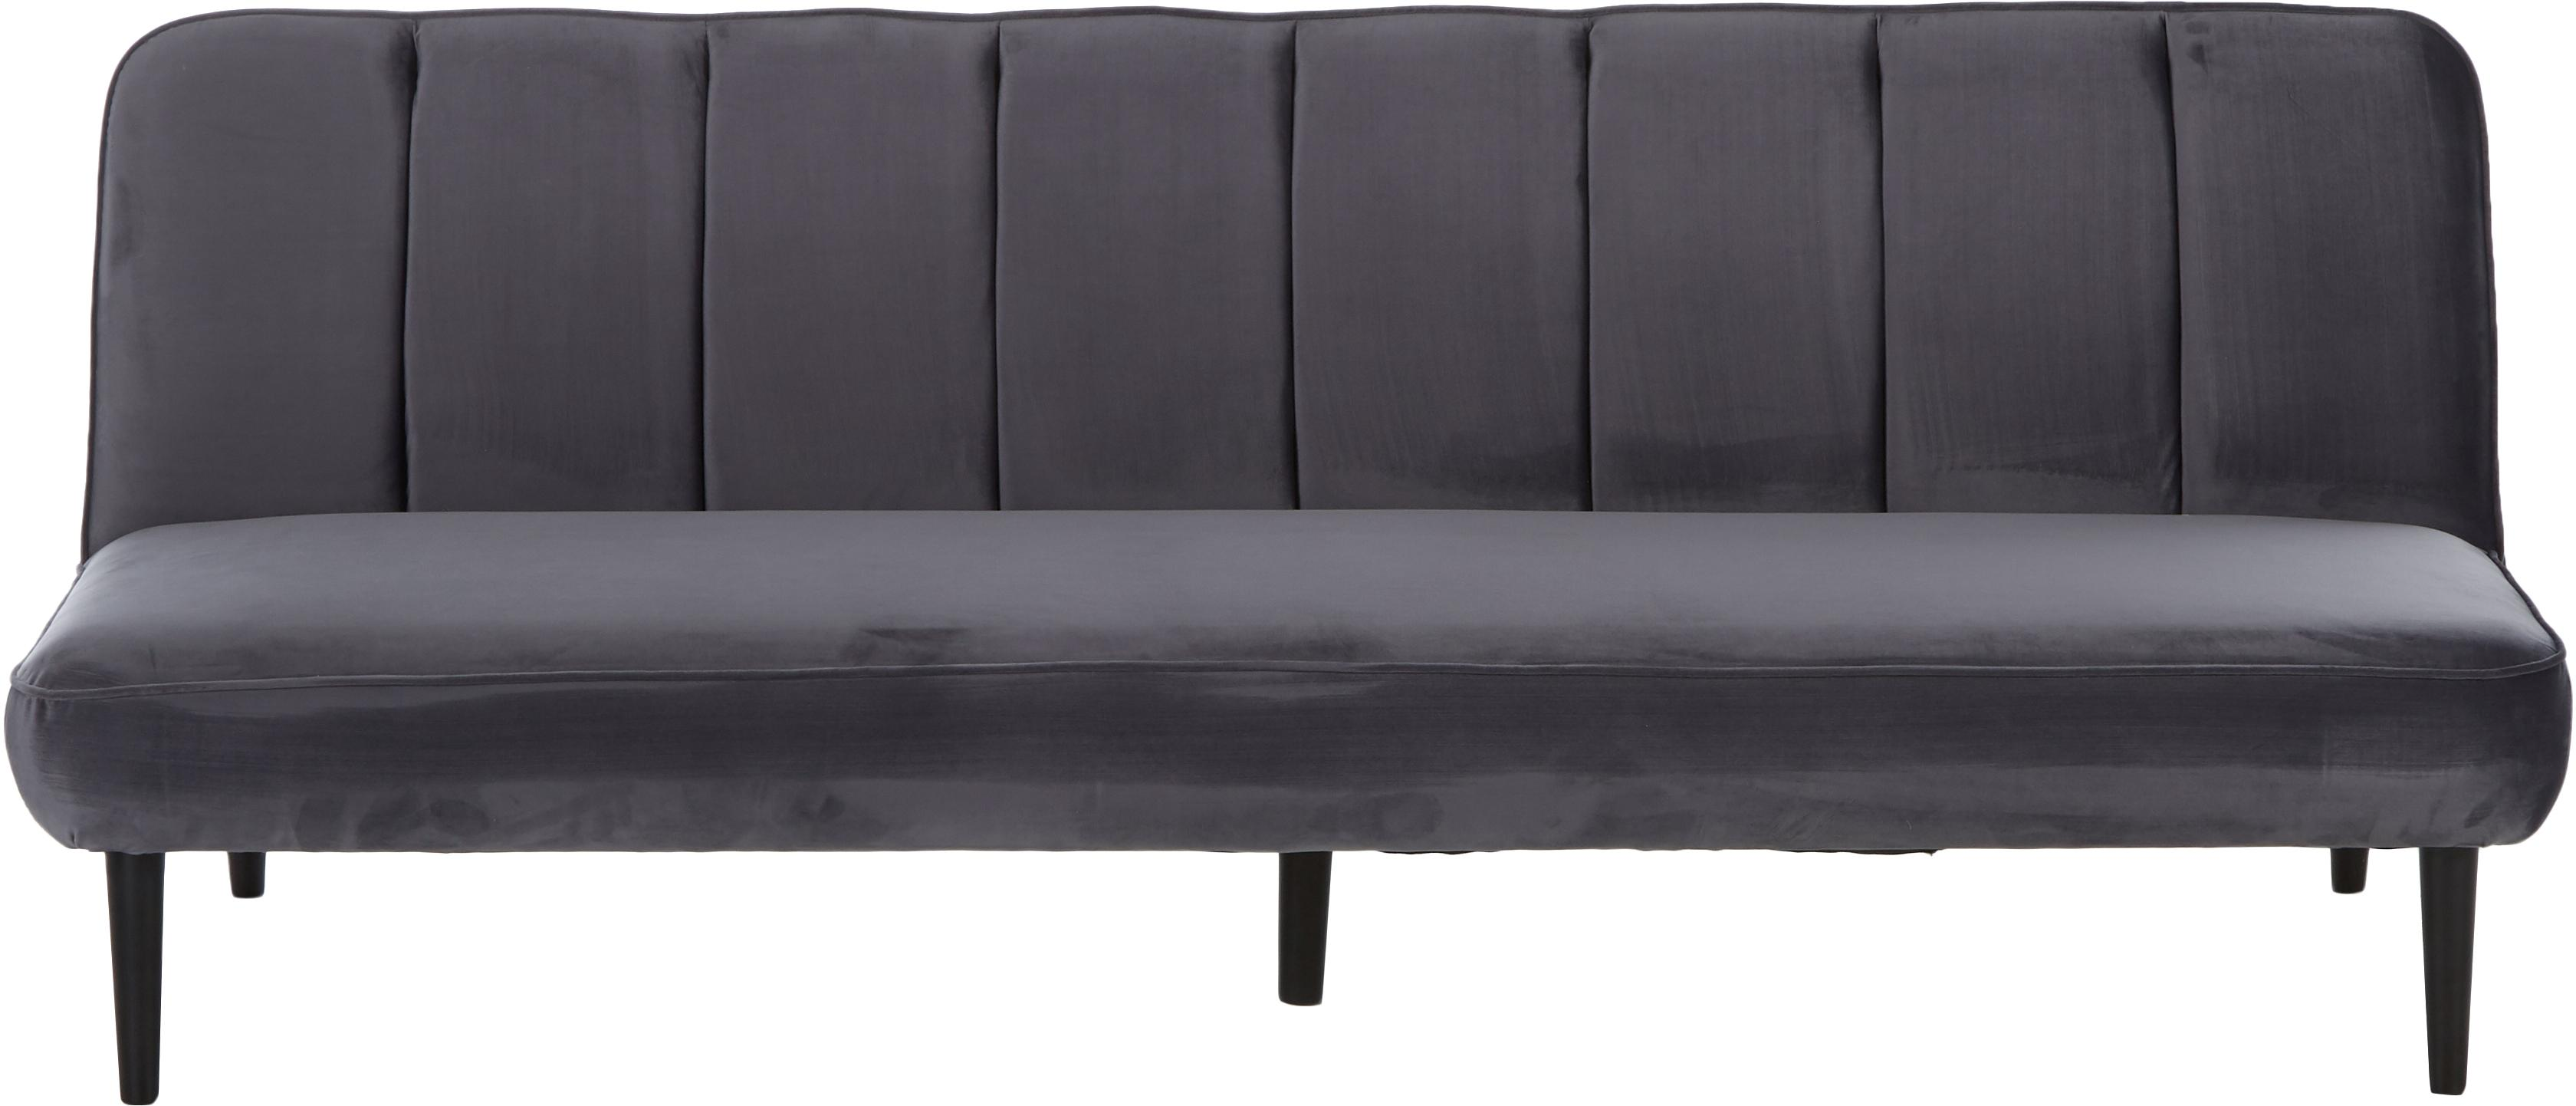 Fluwelen slaapbank Hayley, Bekleding: fluweel (polyester), Frame: grenenhout, Poten: gelakt rubberhout, Grijs, B 200 x D 89 cm